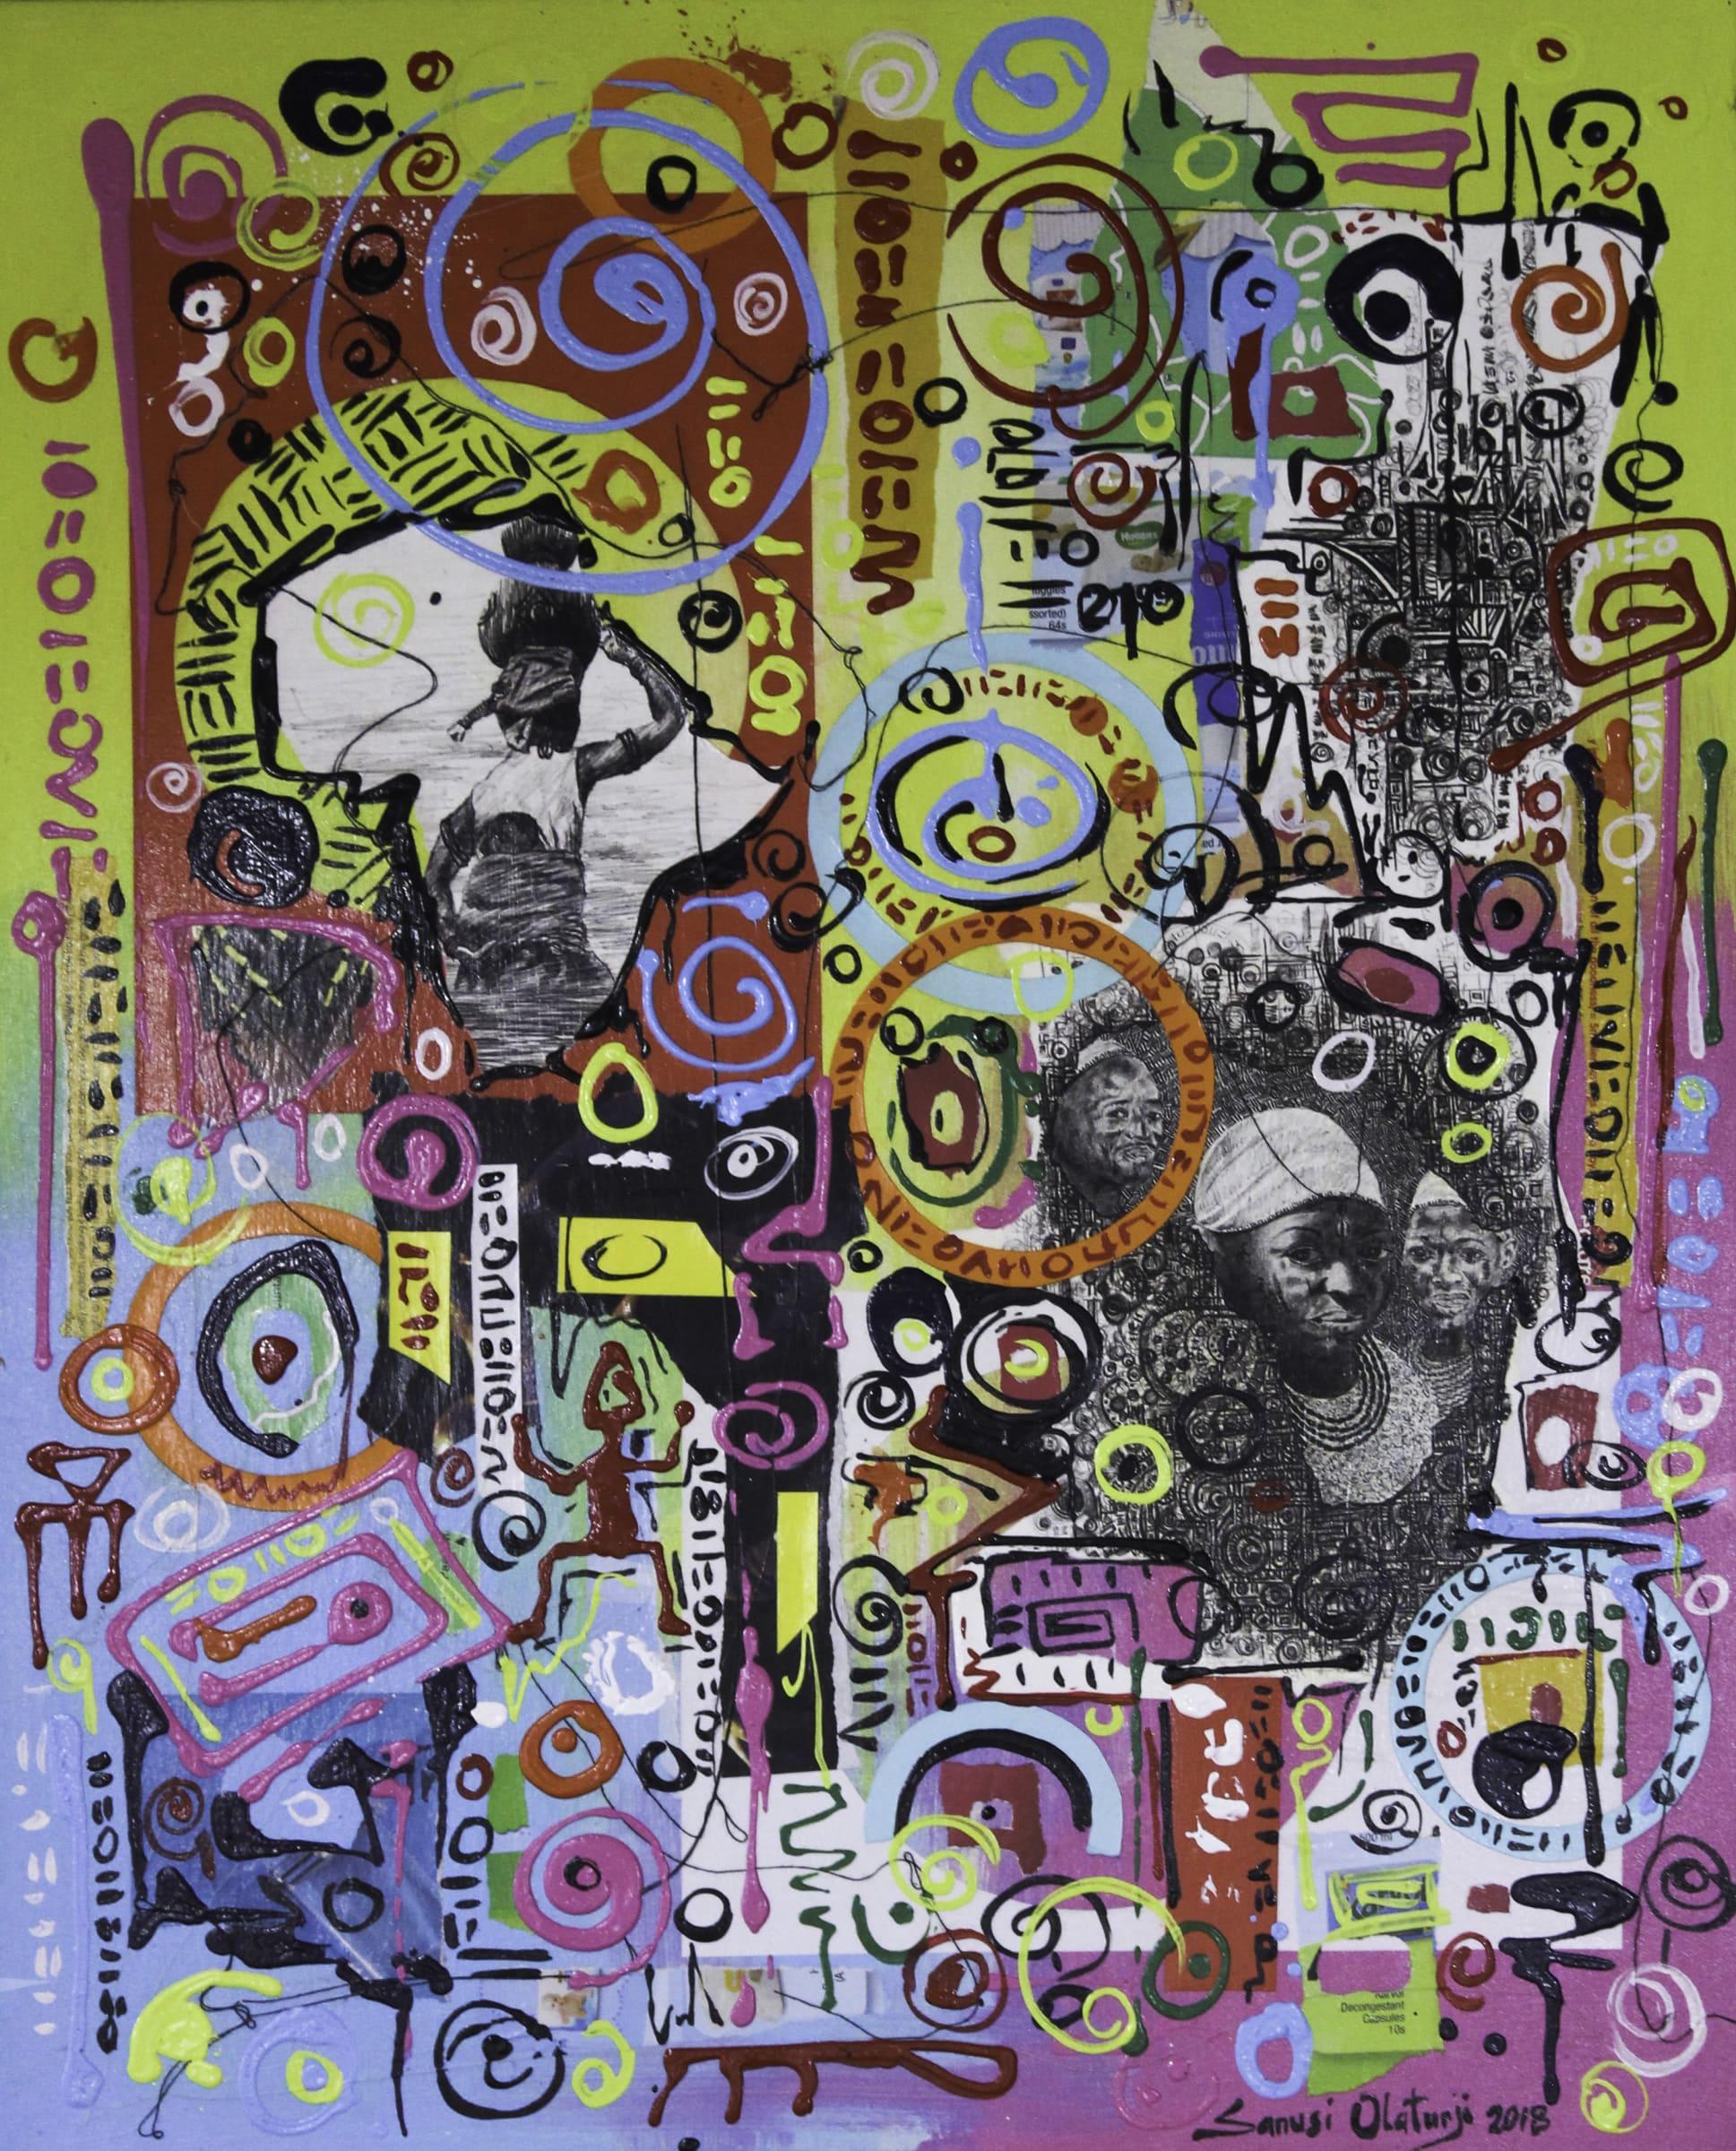 <span class=&#34;link fancybox-details-link&#34;><a href=&#34;/artworks/282-olatunji-sanusi-africa-my-pride-2018/&#34;>View Detail Page</a></span><div class=&#34;artist&#34;><strong>Olatunji Sanusi</strong></div> <div class=&#34;title&#34;><em>Africa My Pride</em>, 2018</div> <div class=&#34;medium&#34;>Mixed Media</div> <div class=&#34;dimensions&#34;>55cm x 170cm</div>